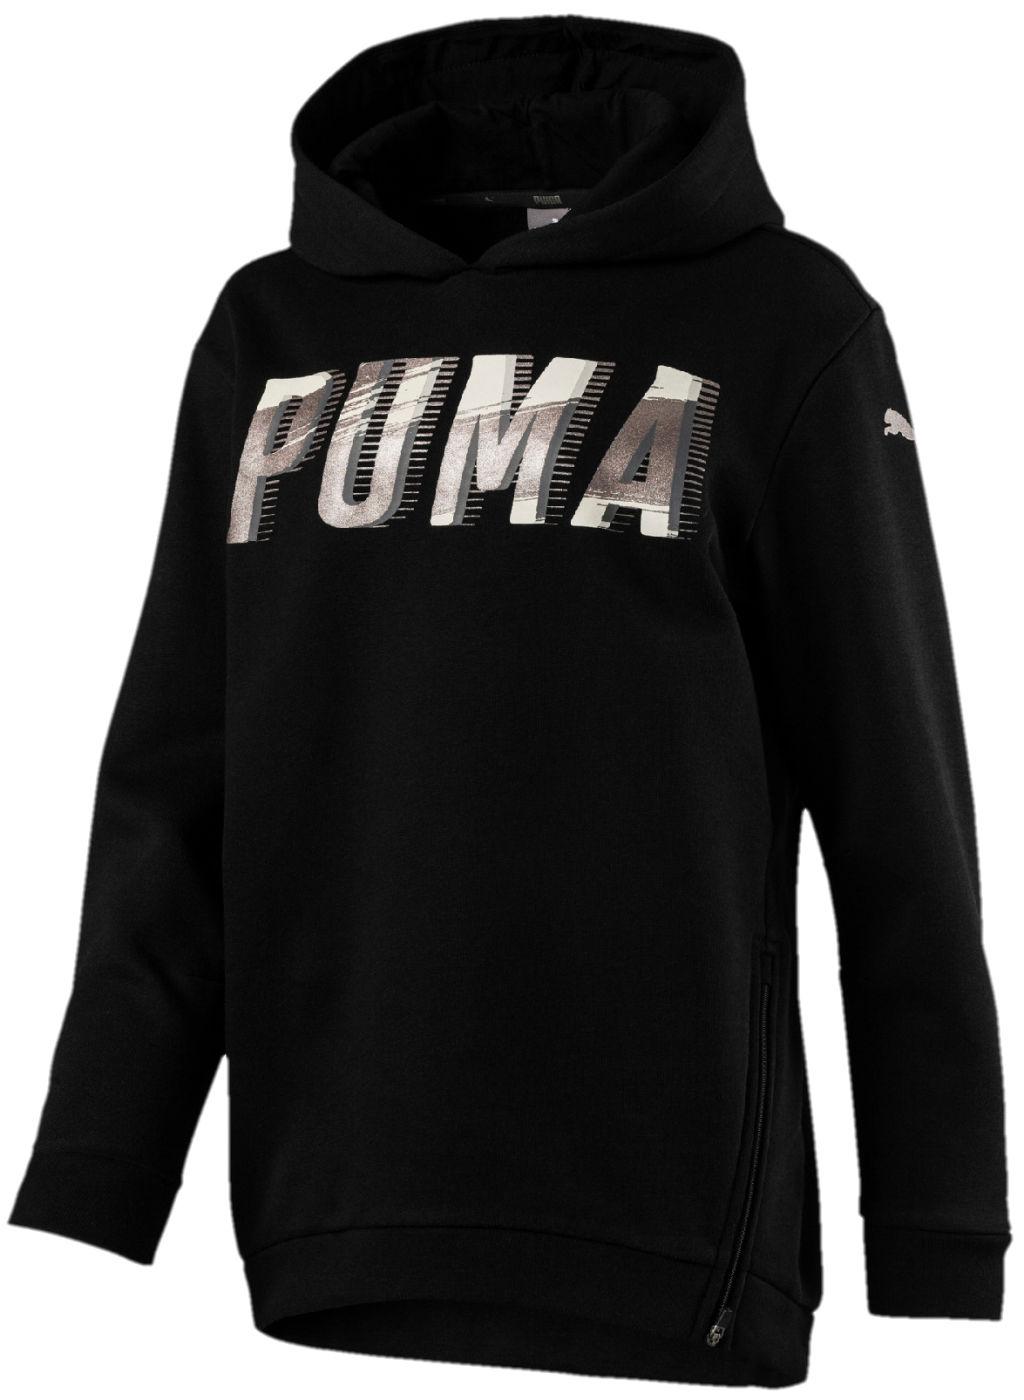 Puma Style tyttöjen huppari Musta a619ca35bc